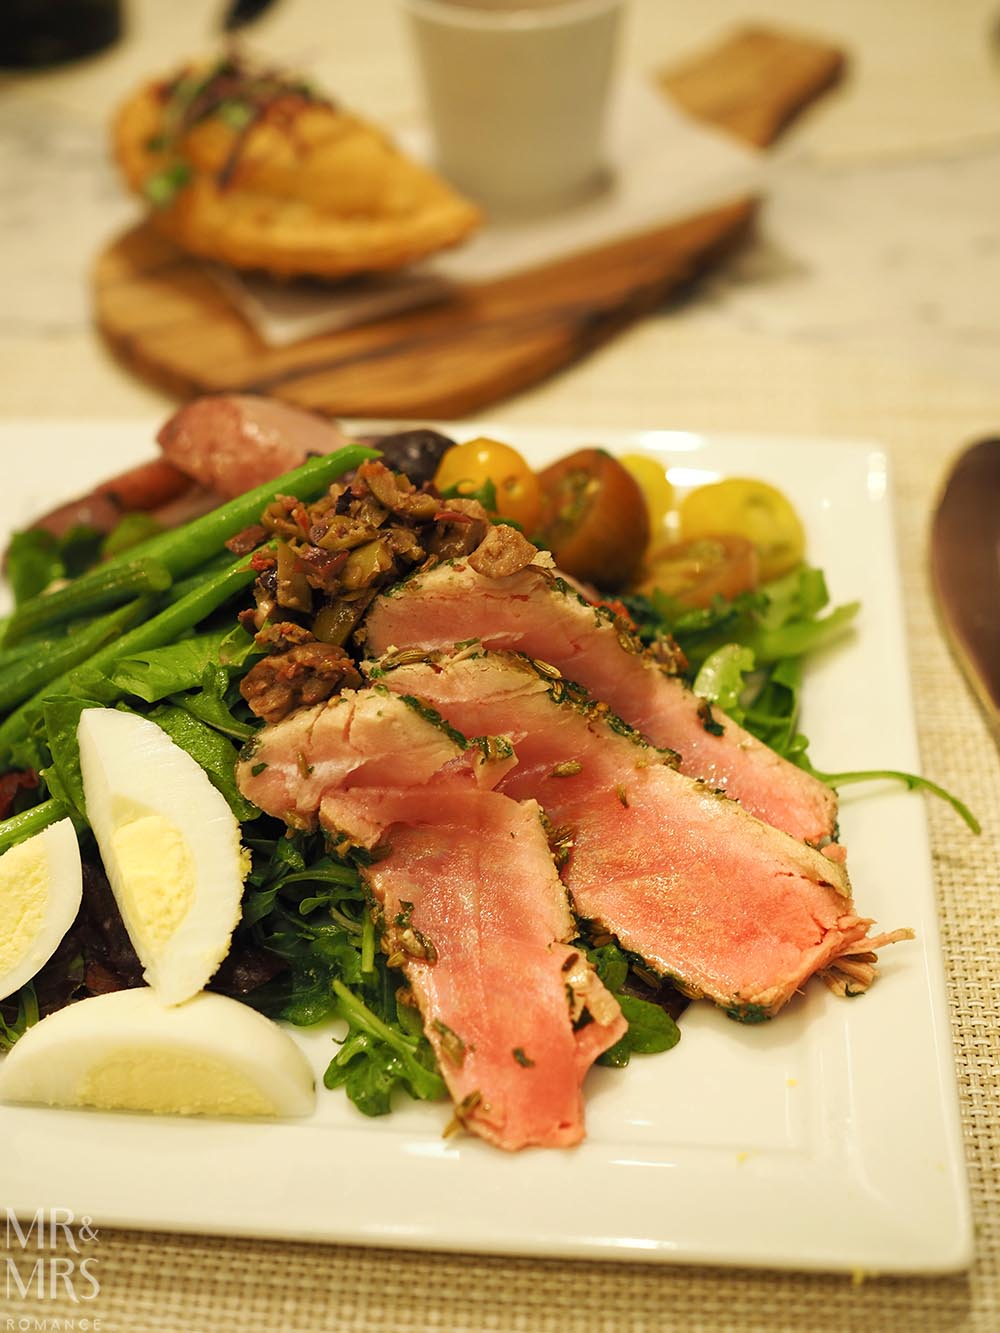 United Polaris Lounge review - The Dining Room seared tuna salad